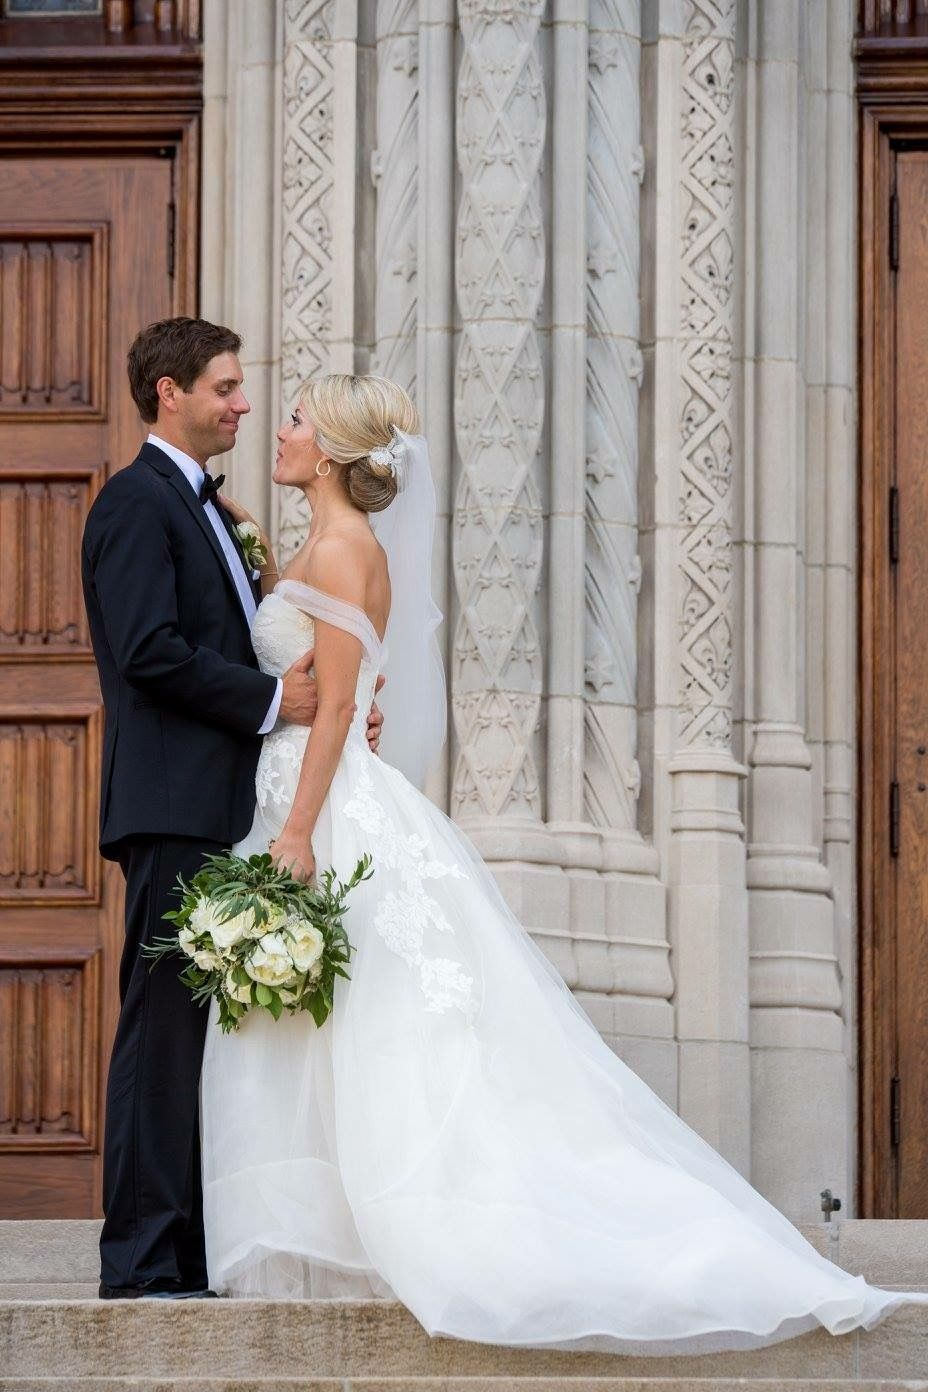 Scottish wedding dresses  Timeless Elegant Wedding at Scottish Rite Cathedral Coordinator